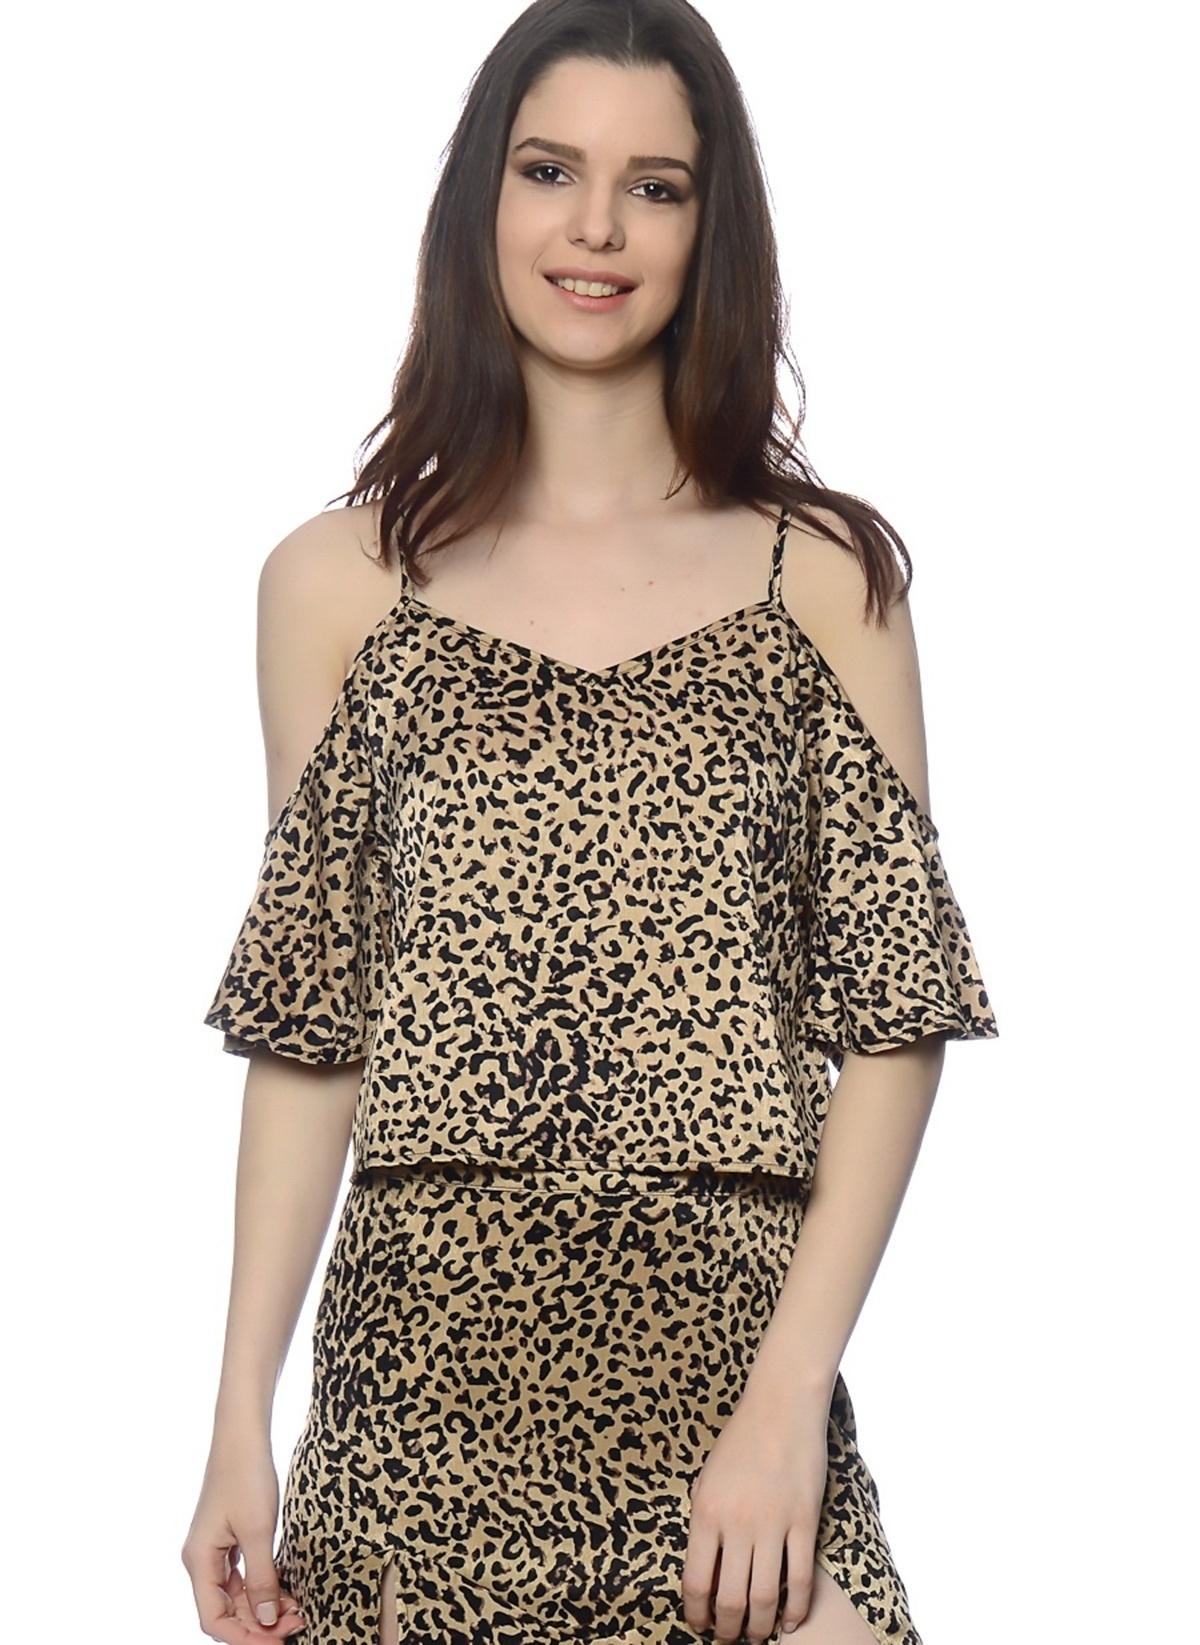 Mink Pink Bluz Im16s1507 Cheetah Fever Shou – 56.99 TL